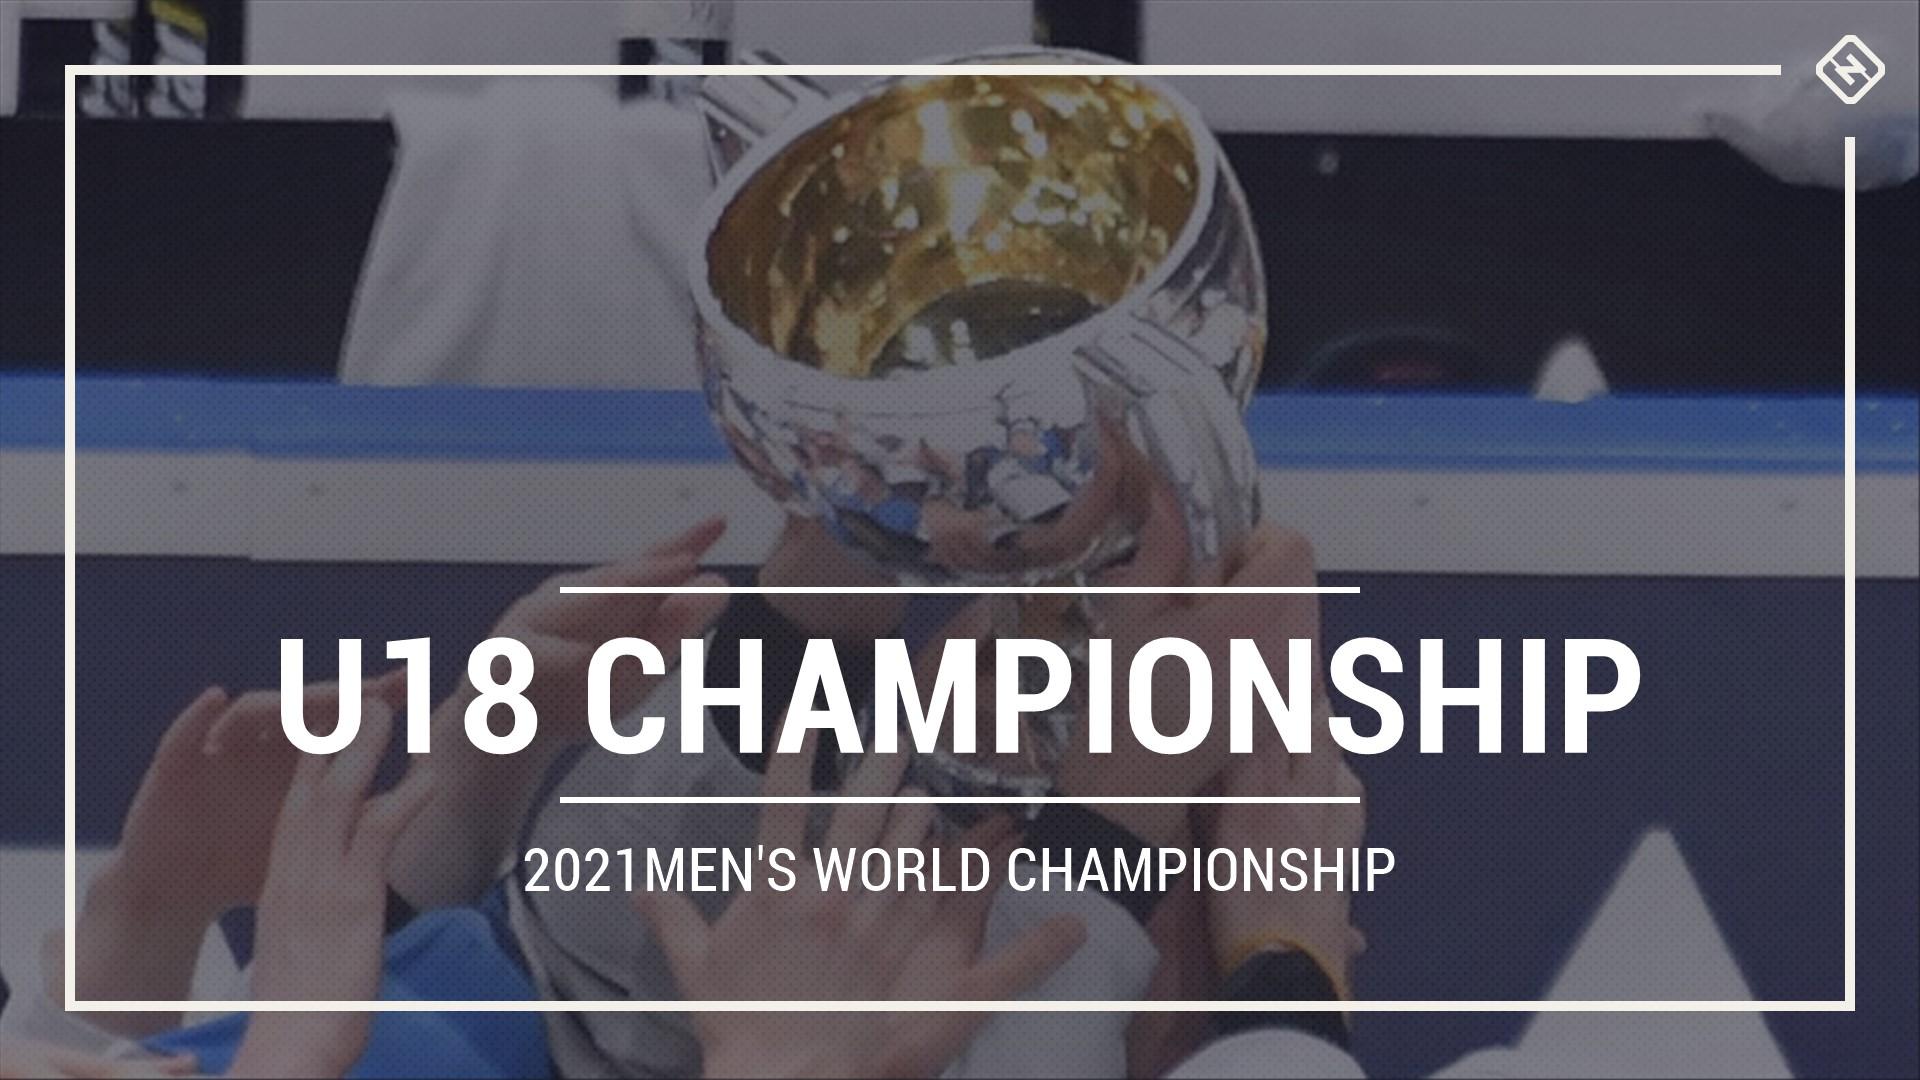 IIHF U18 Men's World Championship 2021: Time, TV channel, live stream, where, when, schedule